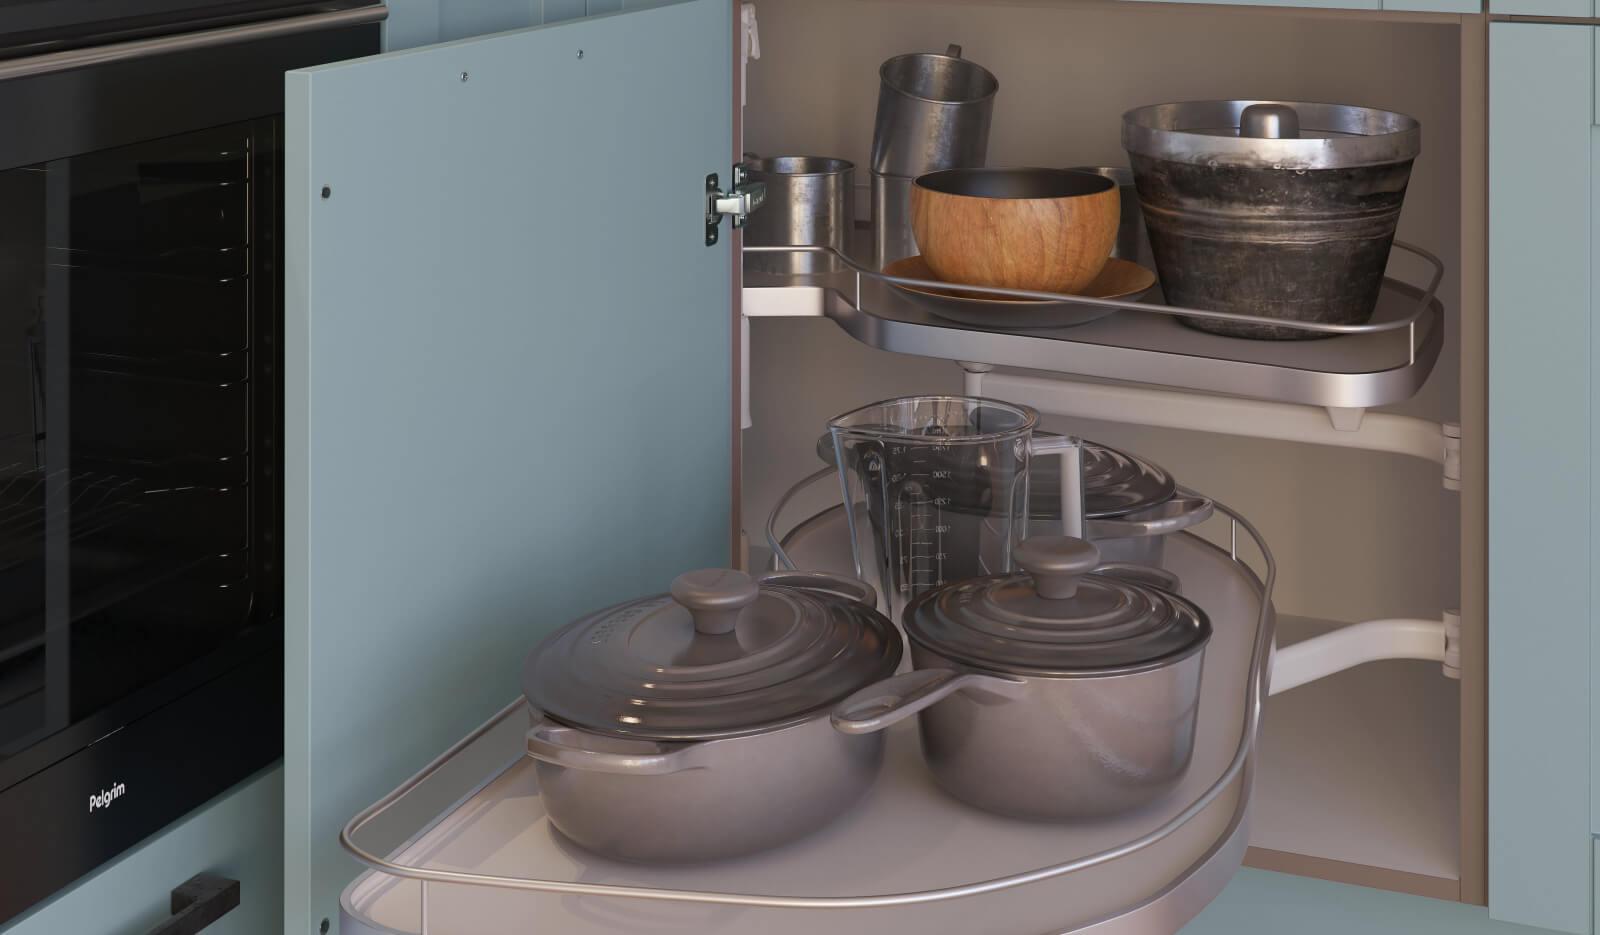 Keuken Keuken Romantiek NCS hemelsblauw - Onderhoekkast Le Mans